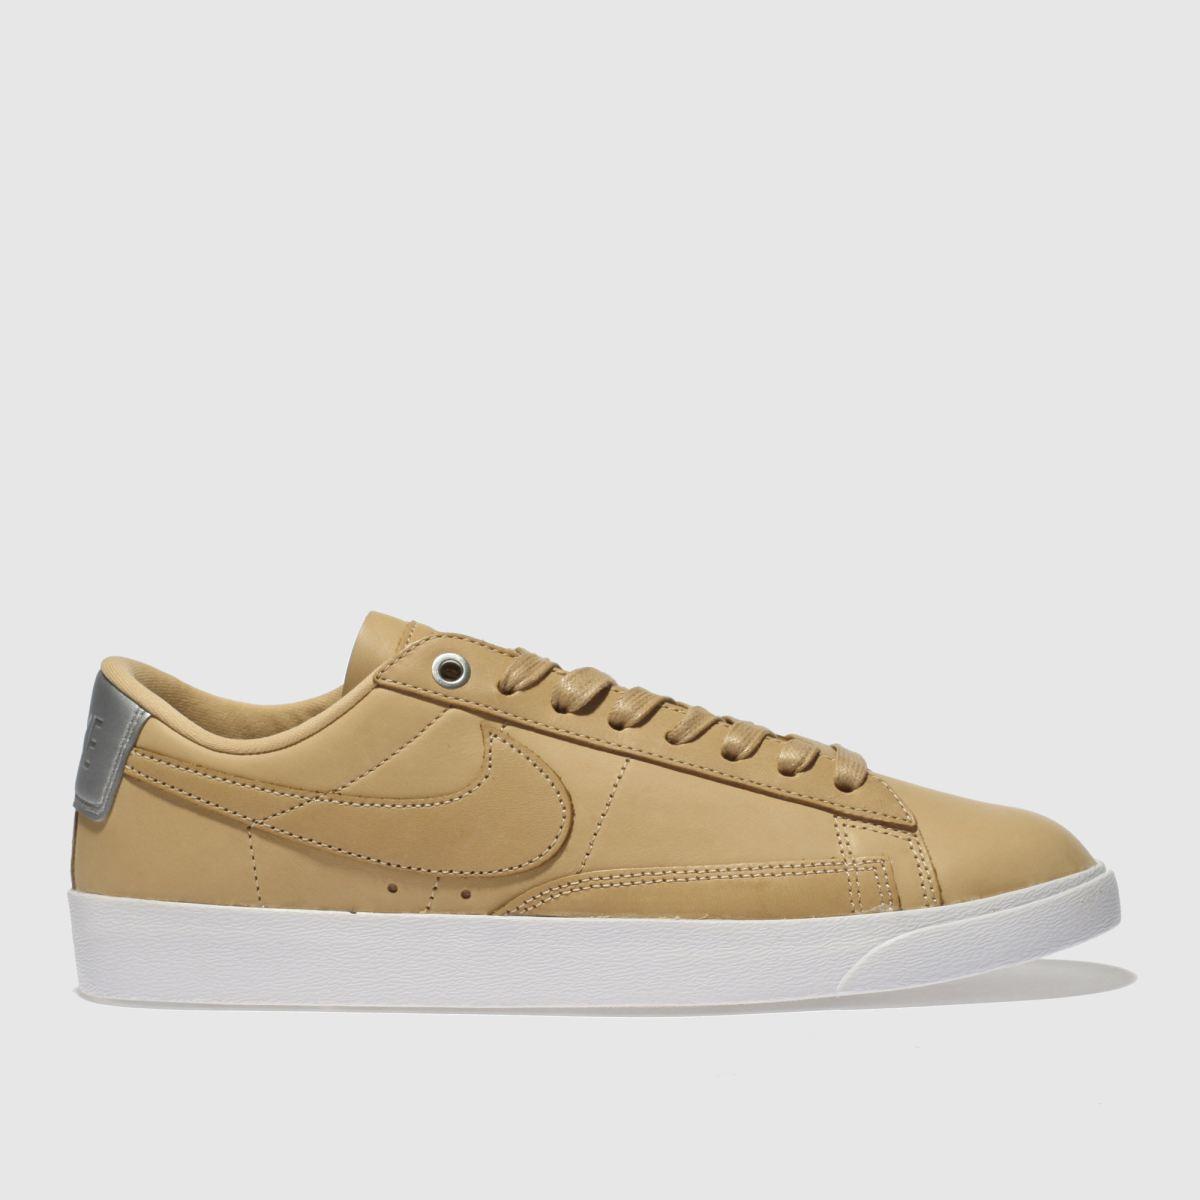 Nike Natural Blazer Low Premium Trainers